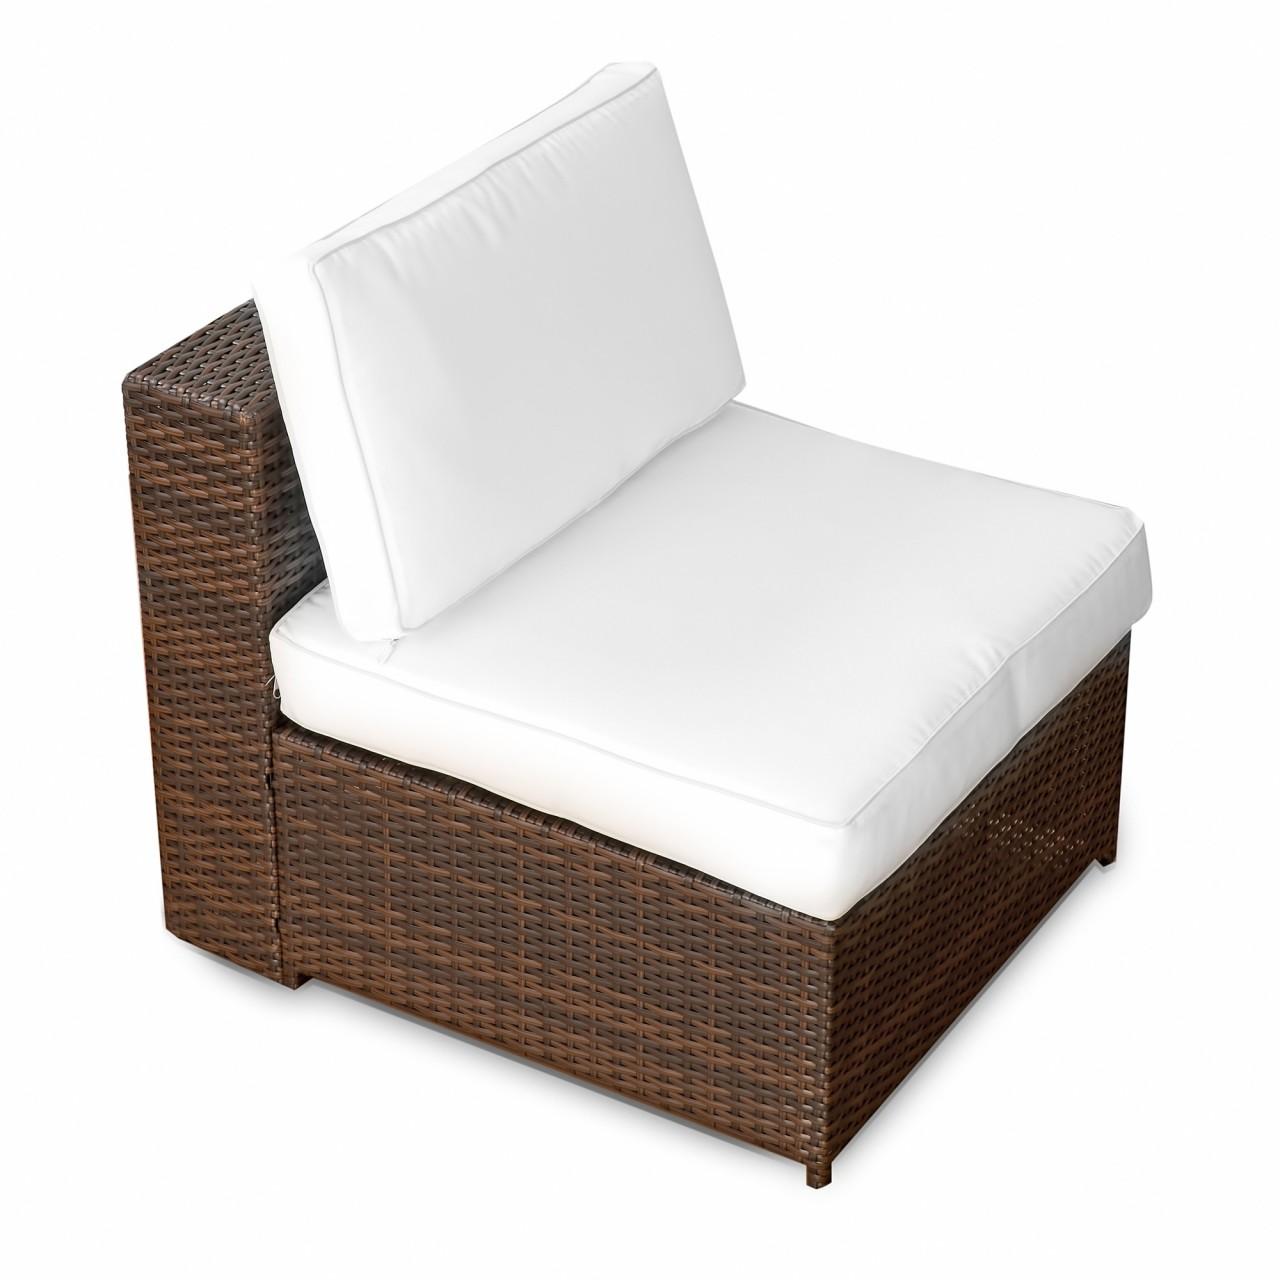 Lounge Sessel Garten ▻ günstig ◅ Garten Lounge Sessel kaufen